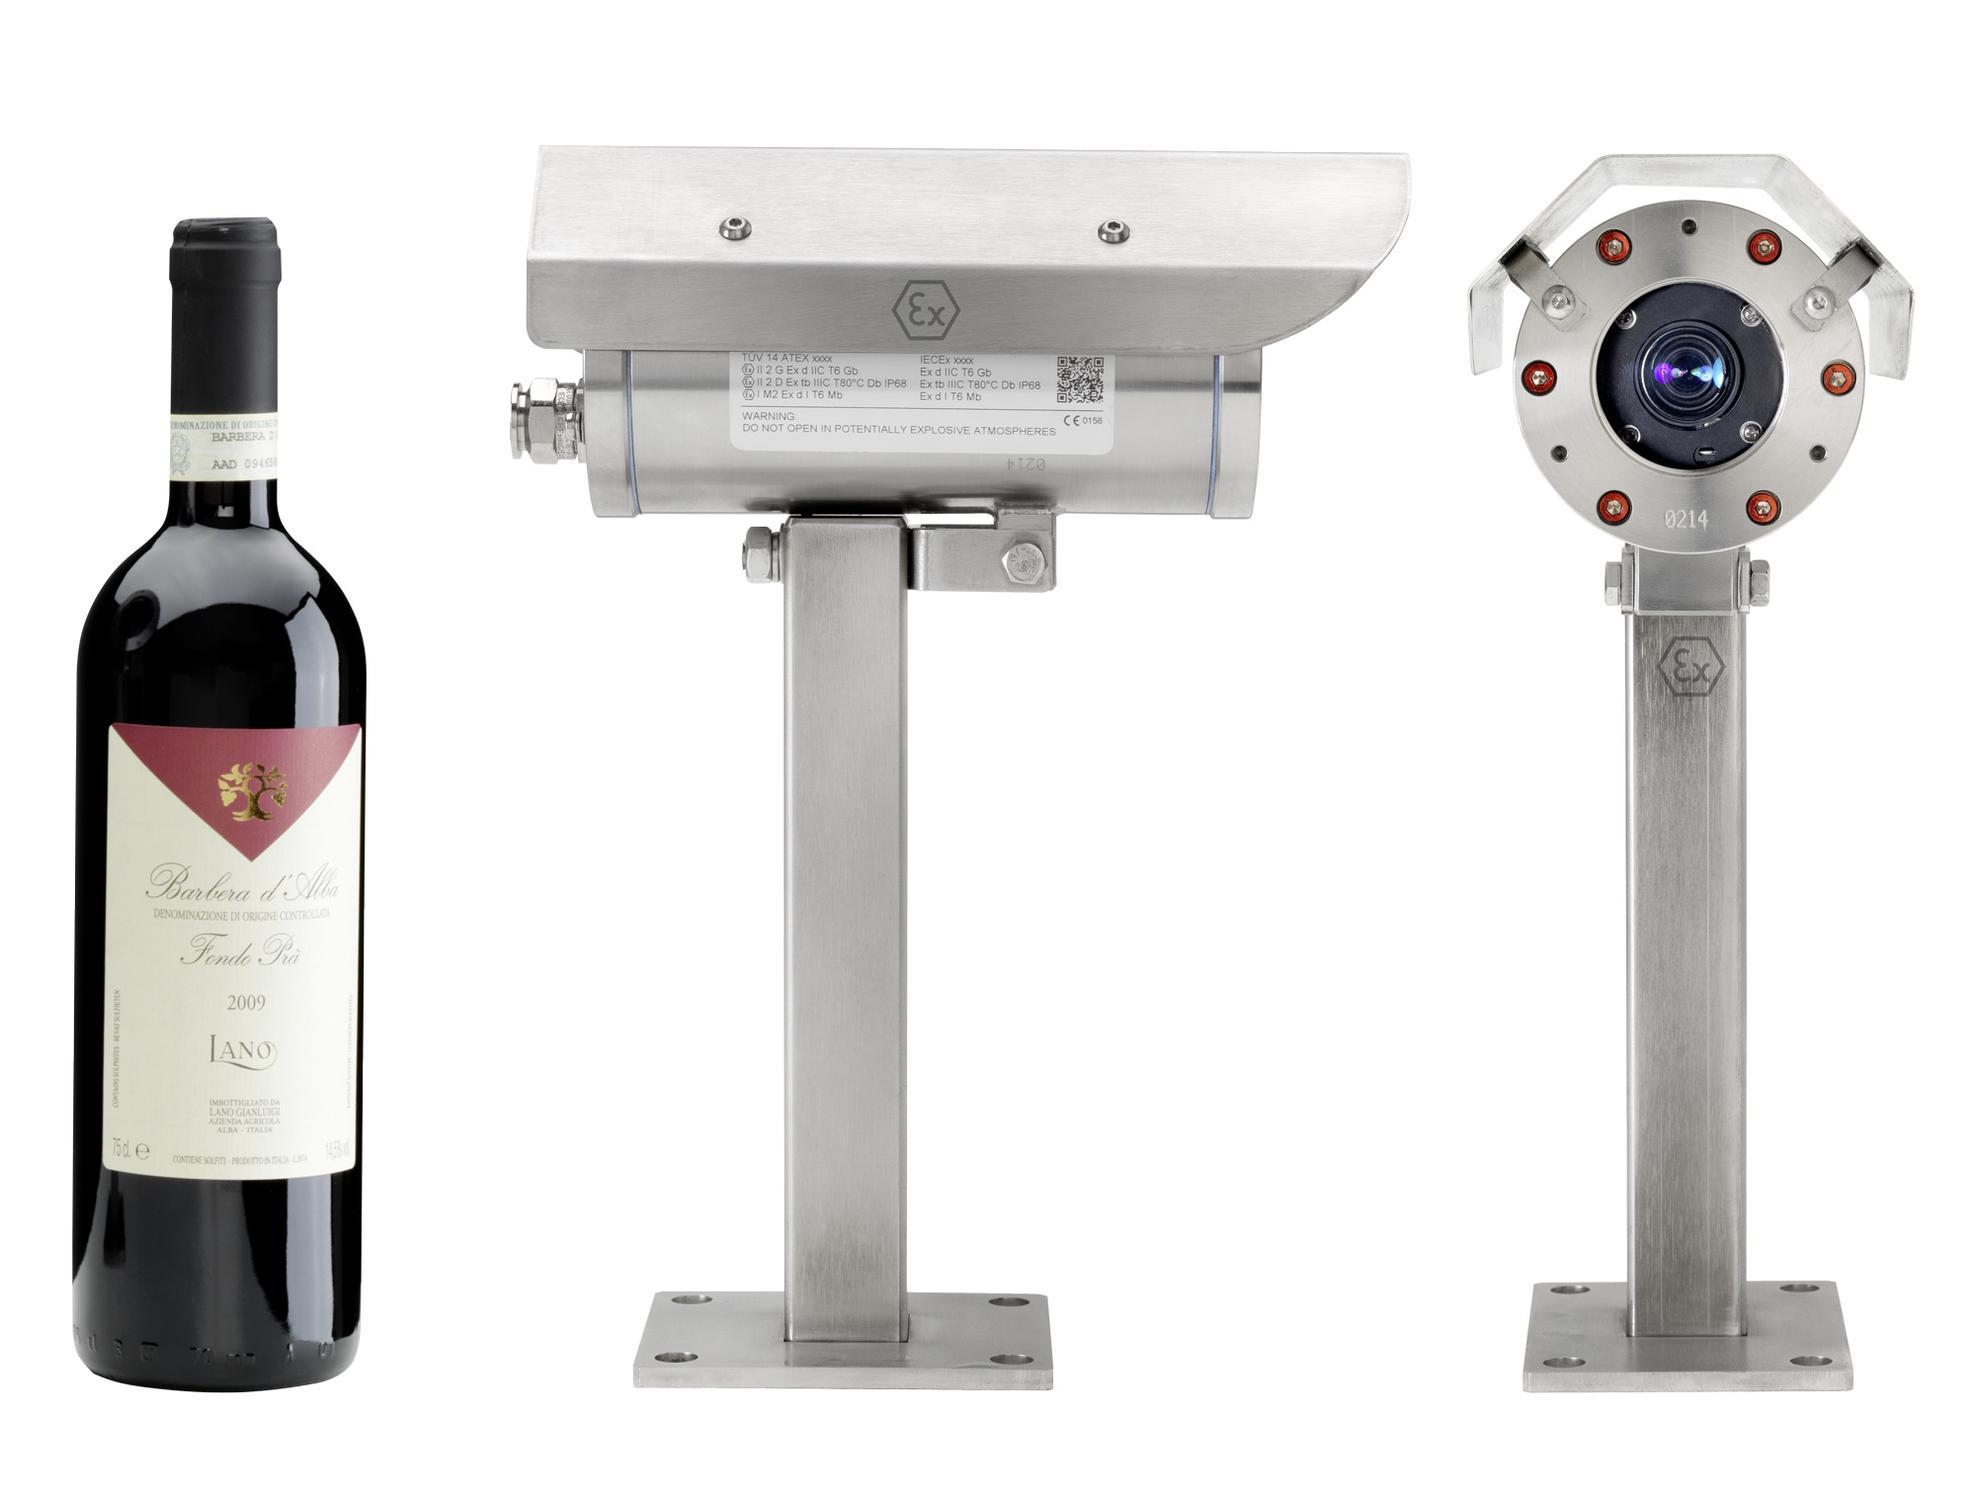 ExCam IPM3014 - Ex-CCTV Network Camera with Fix Lens